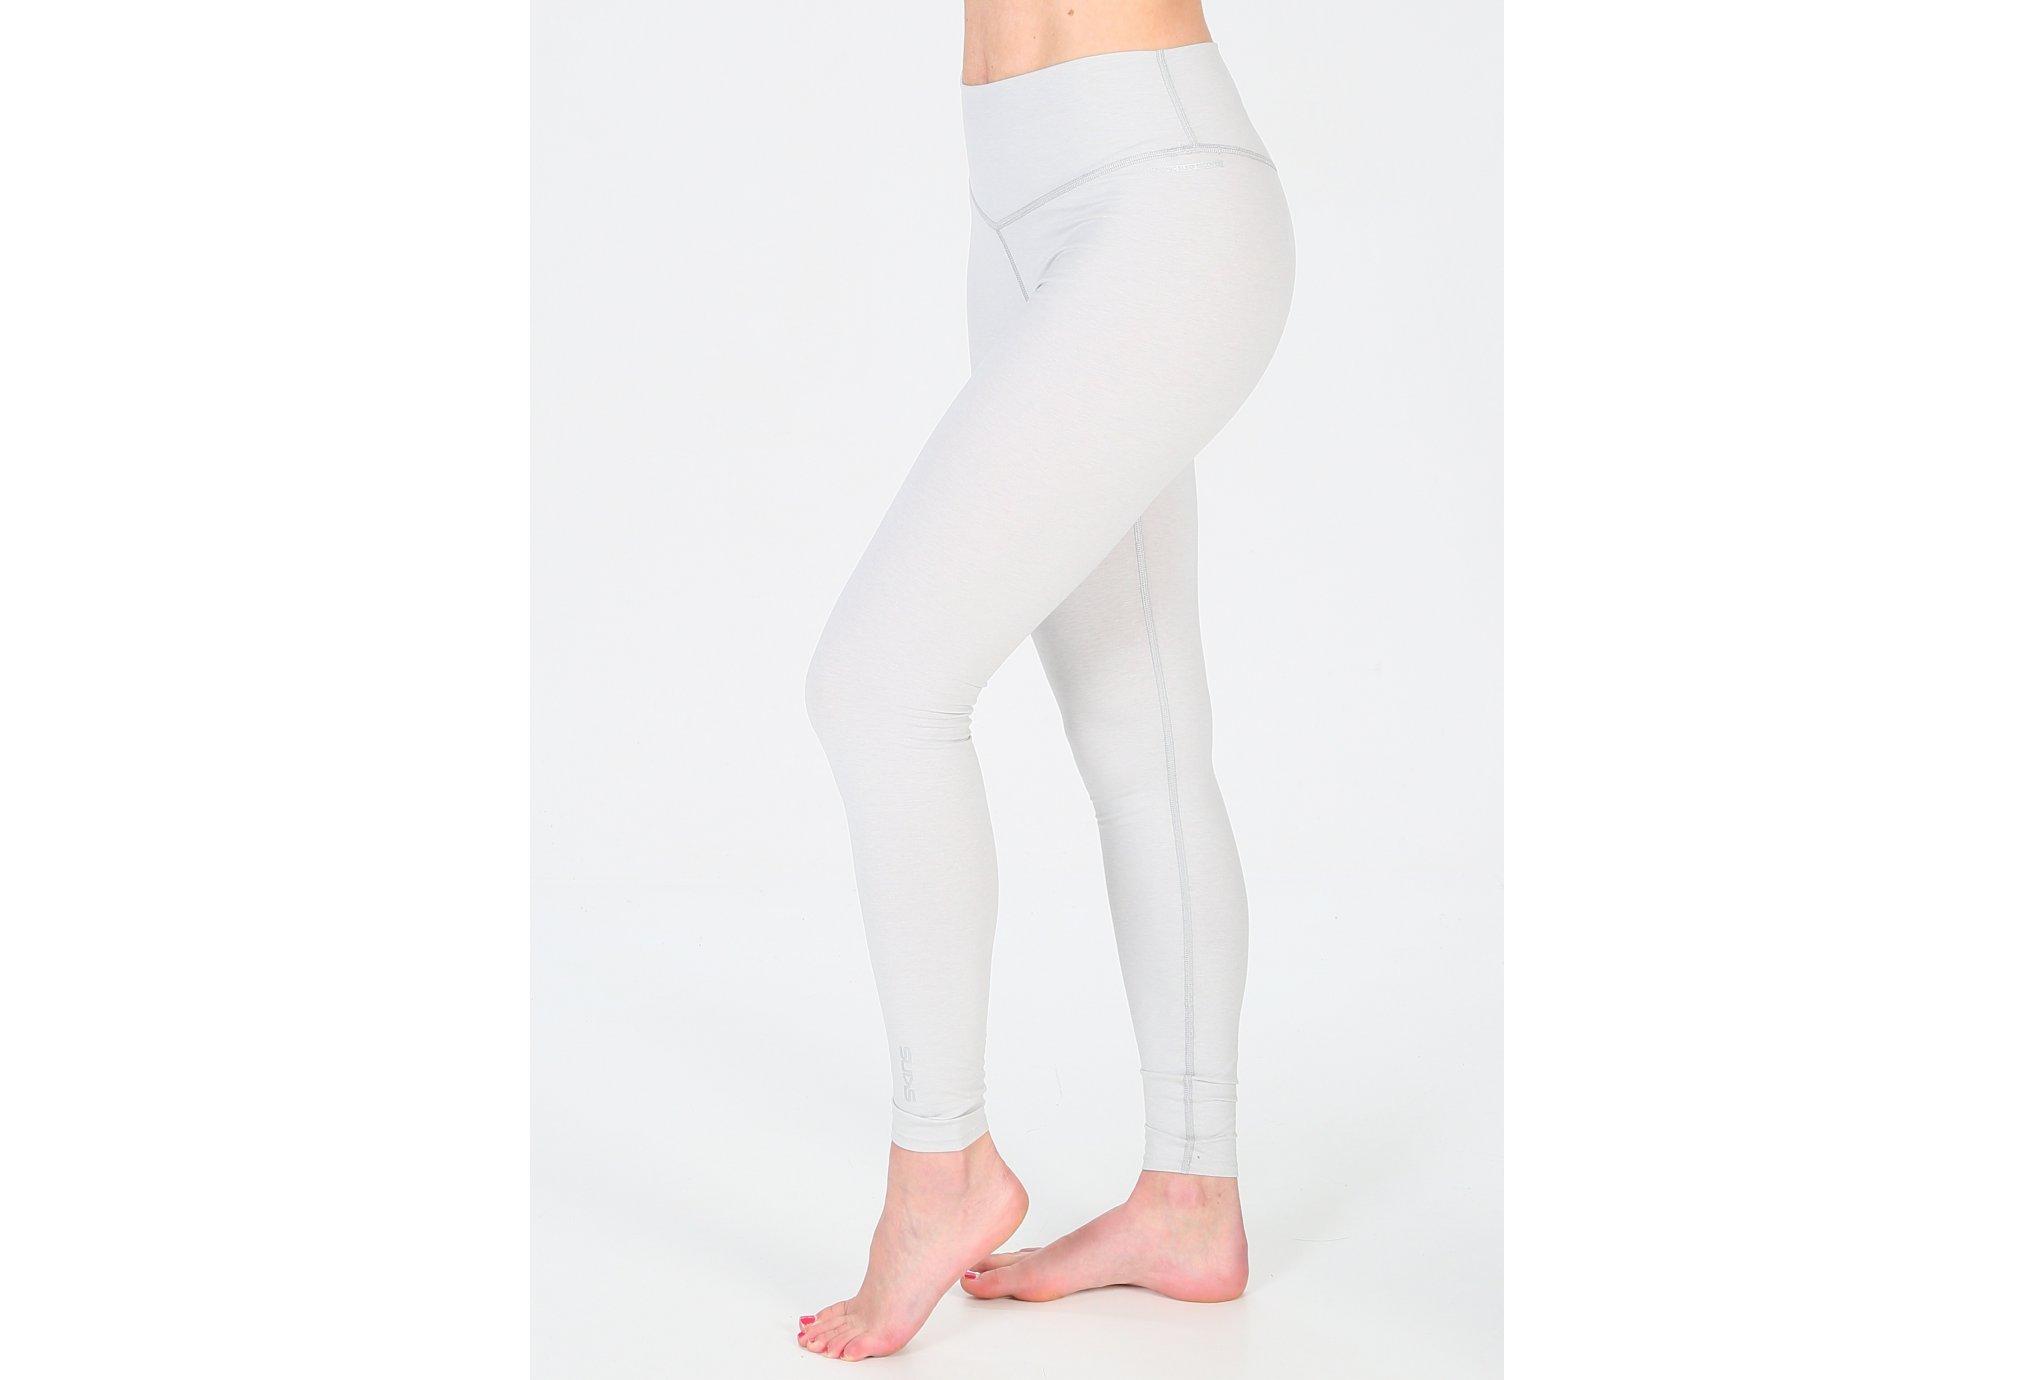 Skins DNAmic Sleep Recovery W Diététique Vêtements femme